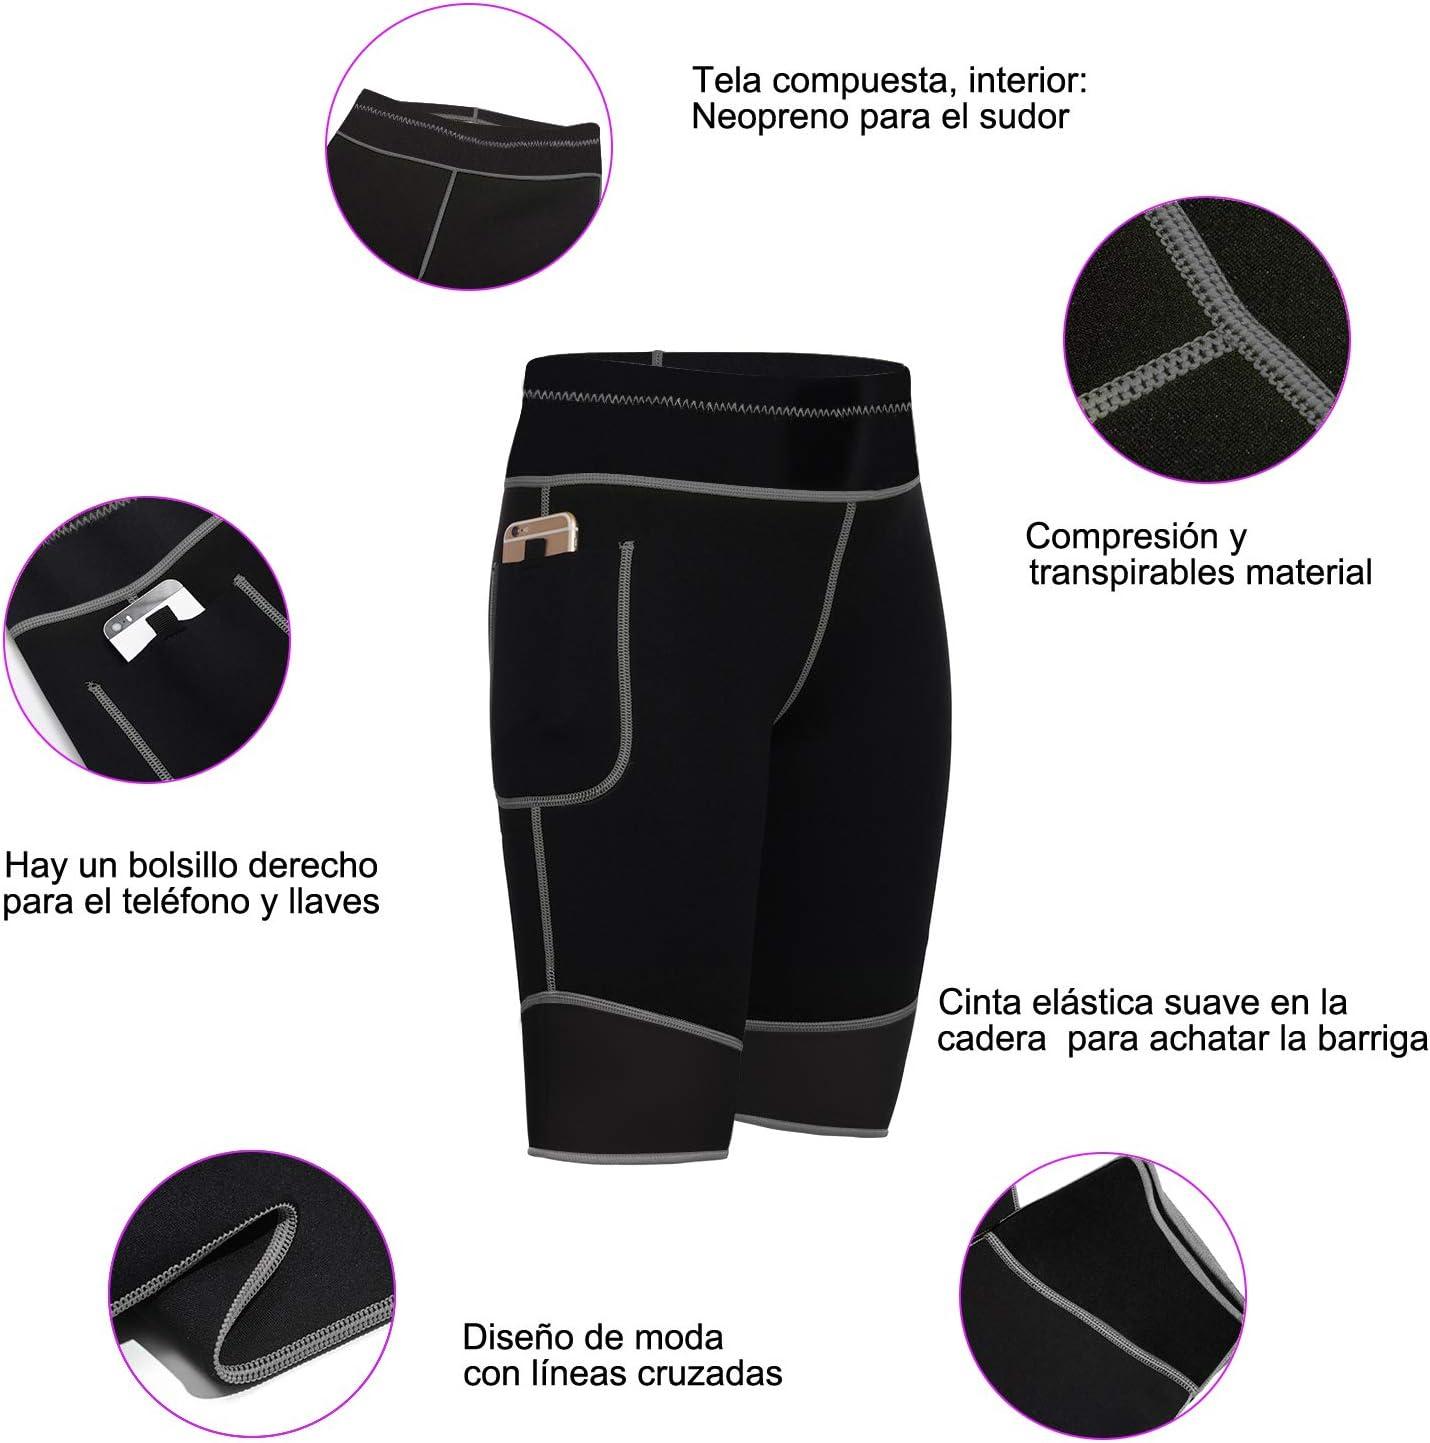 Bingrong Pantalones para Adelgazar Mujer Pantal/ón de Sudoraci/ón Adelgazar Pantalones Cortos de Neopreno t/érmicos para Ejercicio para P/érdida de Peso Deportivo